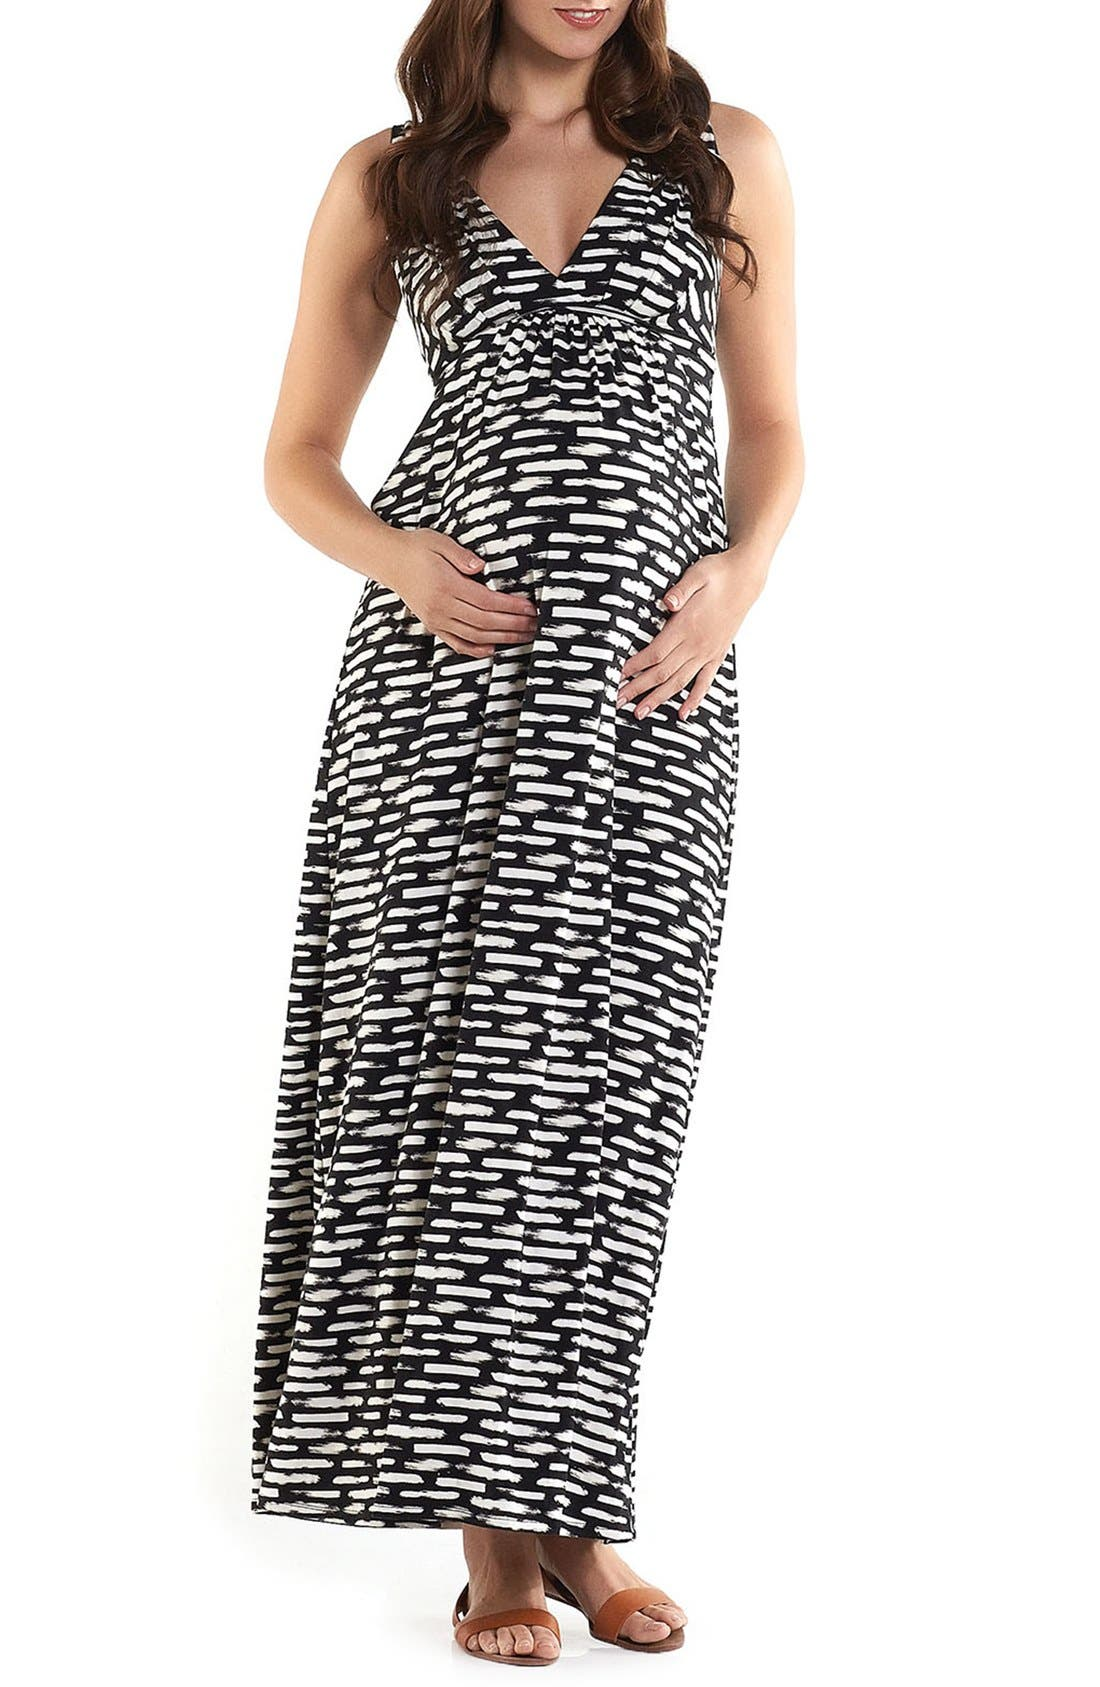 TART MATERNITY, 'Chloe' Maternity Maxi Dress, Main thumbnail 1, color, BRUSHSTROKES